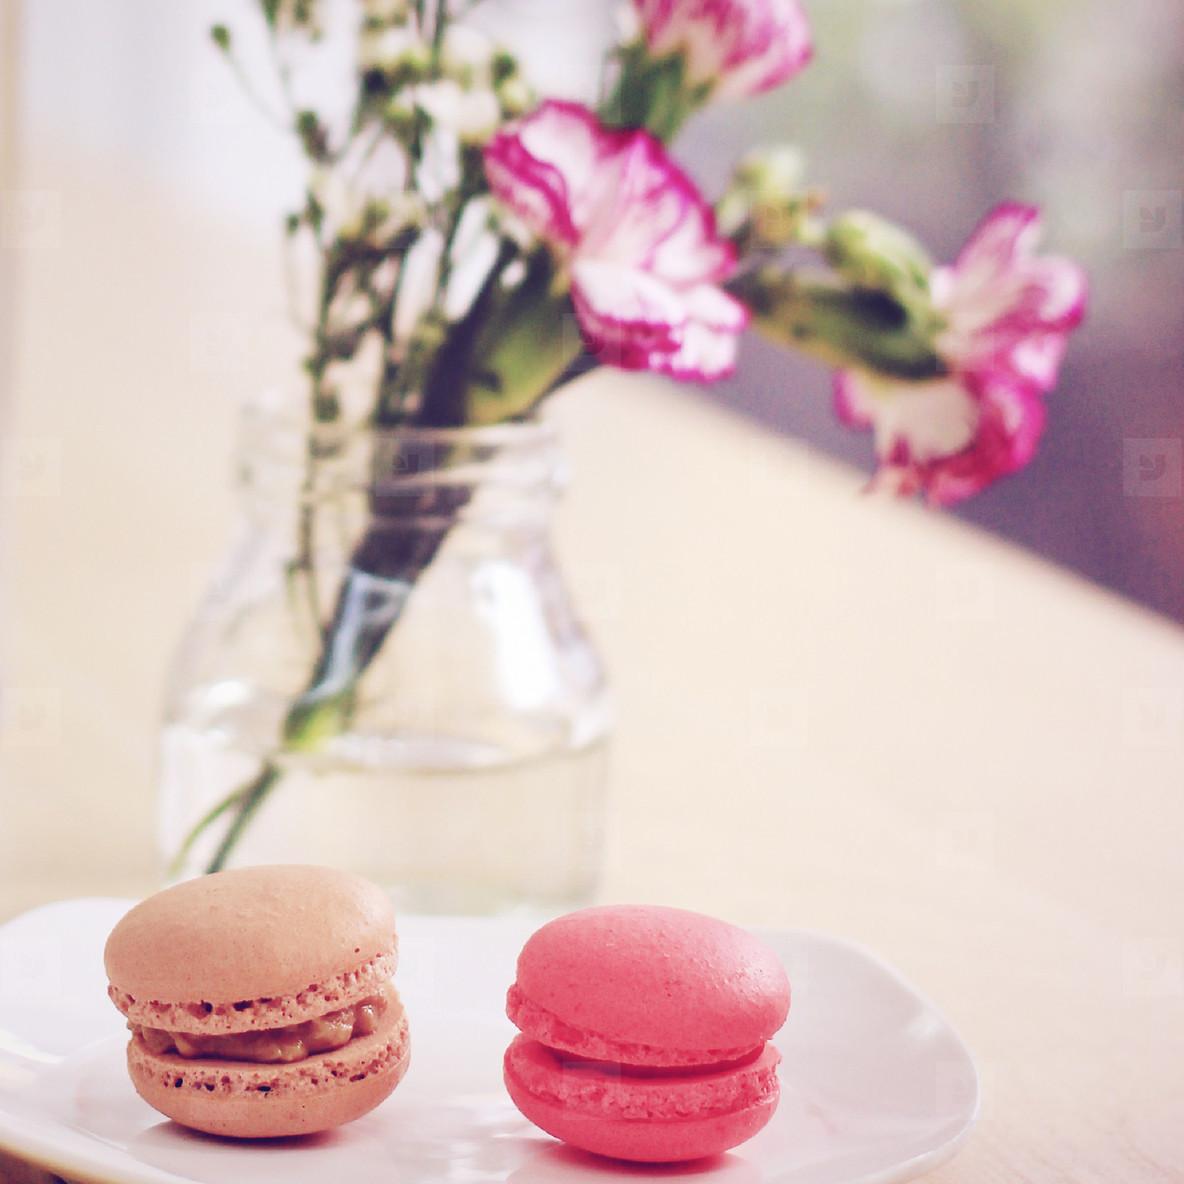 Tasty sweet macaron